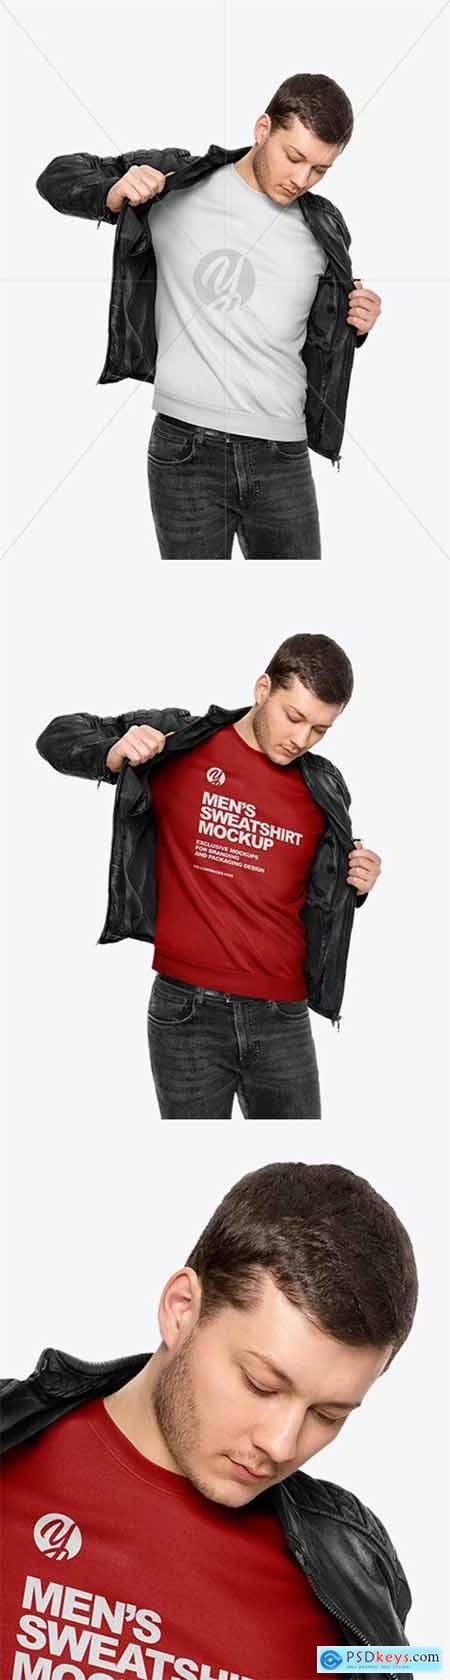 Man in a Sweatshirt and a Jacket Mockup 58455